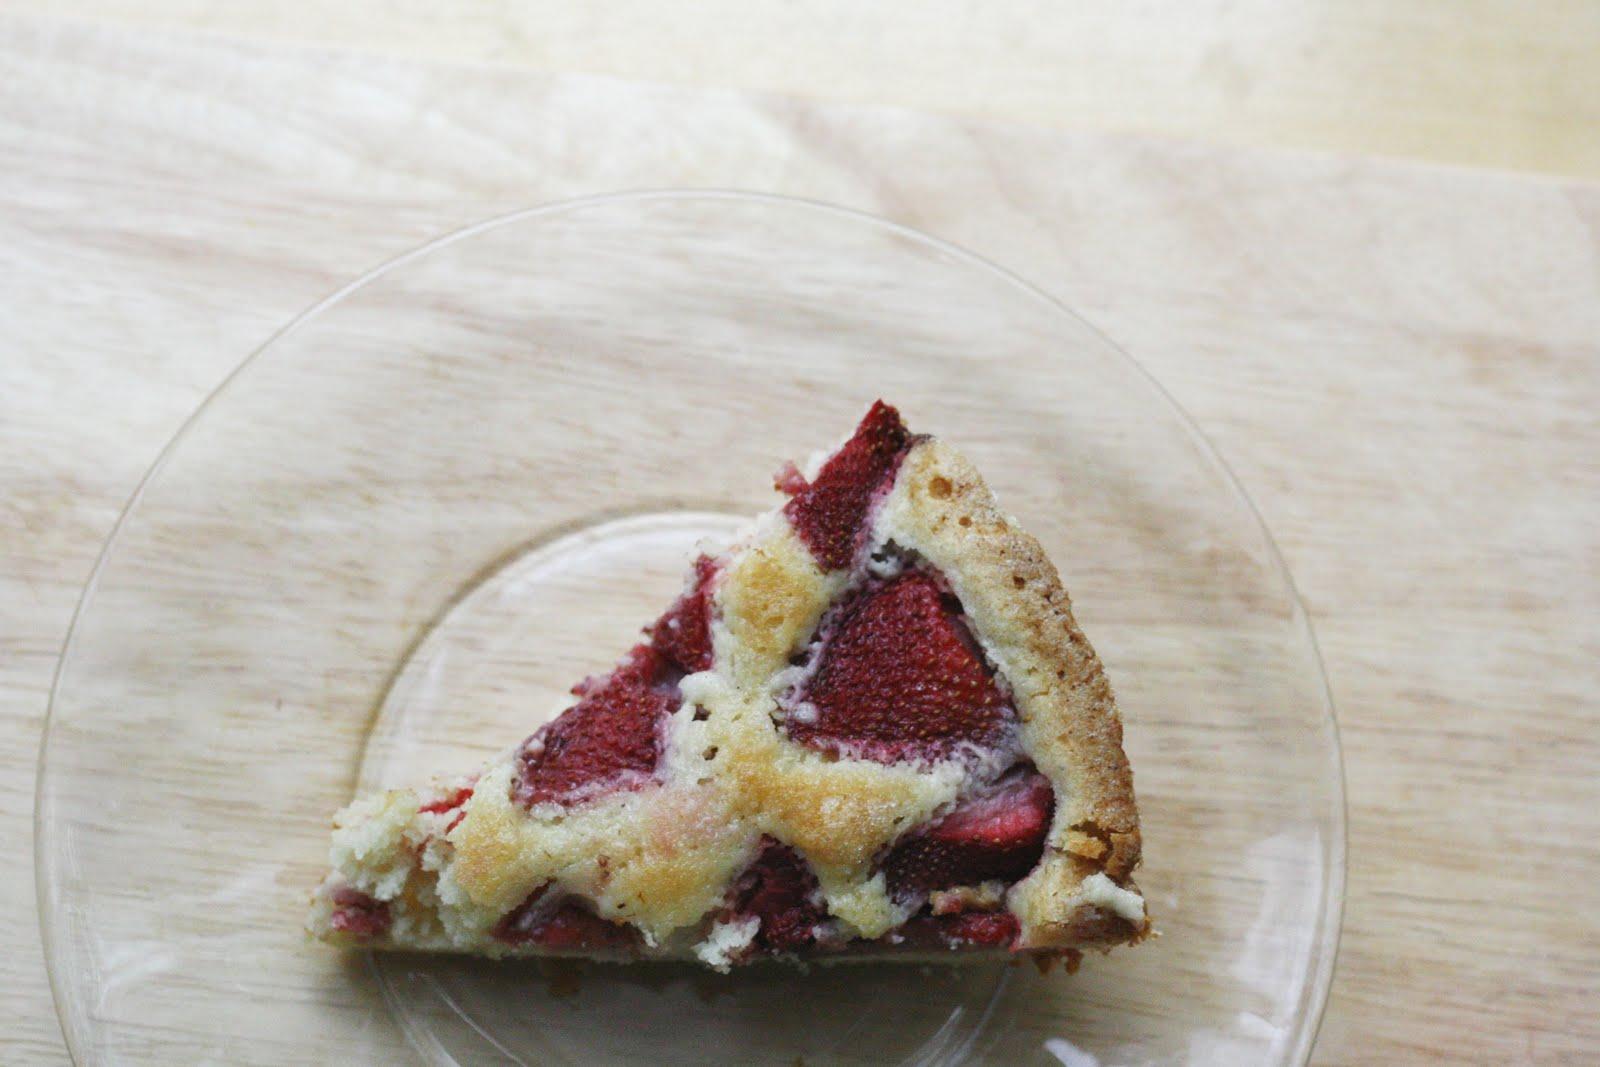 strawberry buttermilk cake | The Vanilla Bean Blog